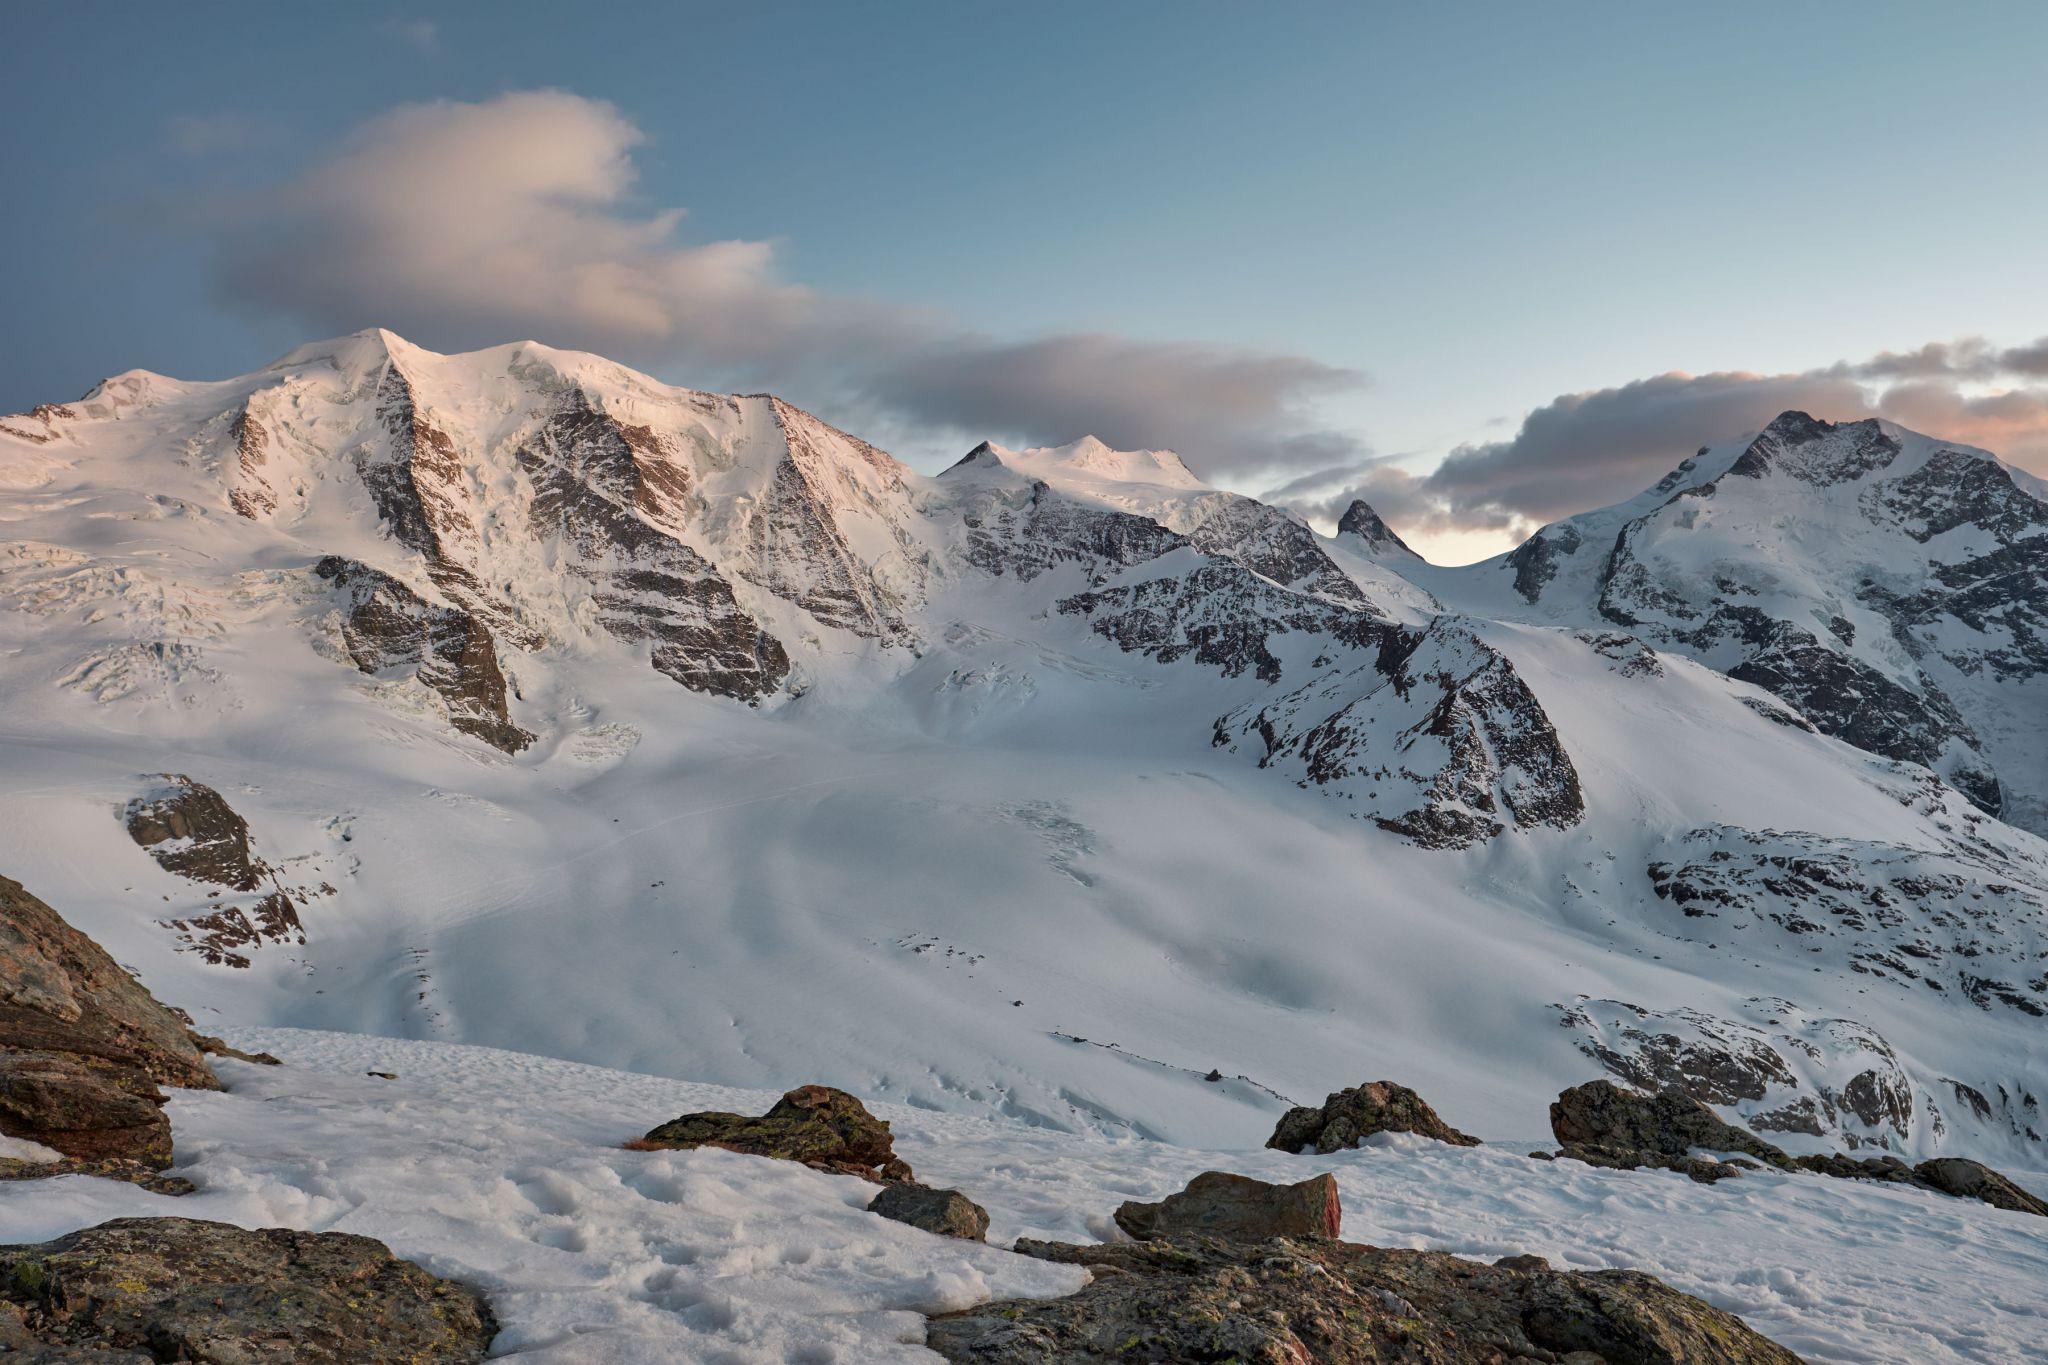 The Diavolezza, Switzerland